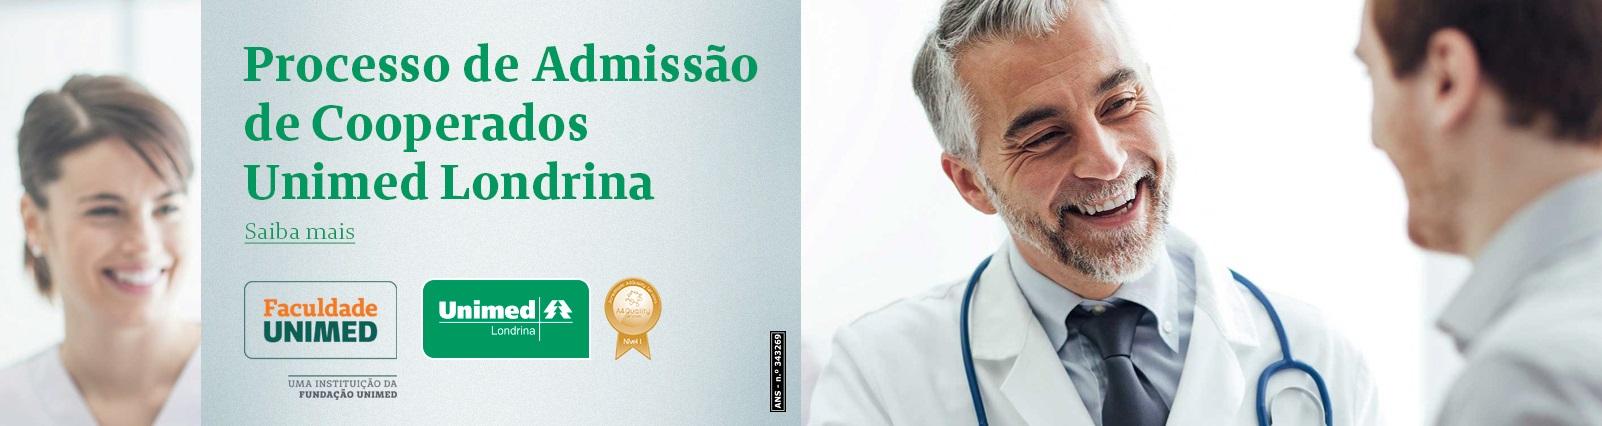 Processo Seletivo Novos Cooperados Unimed Londrina